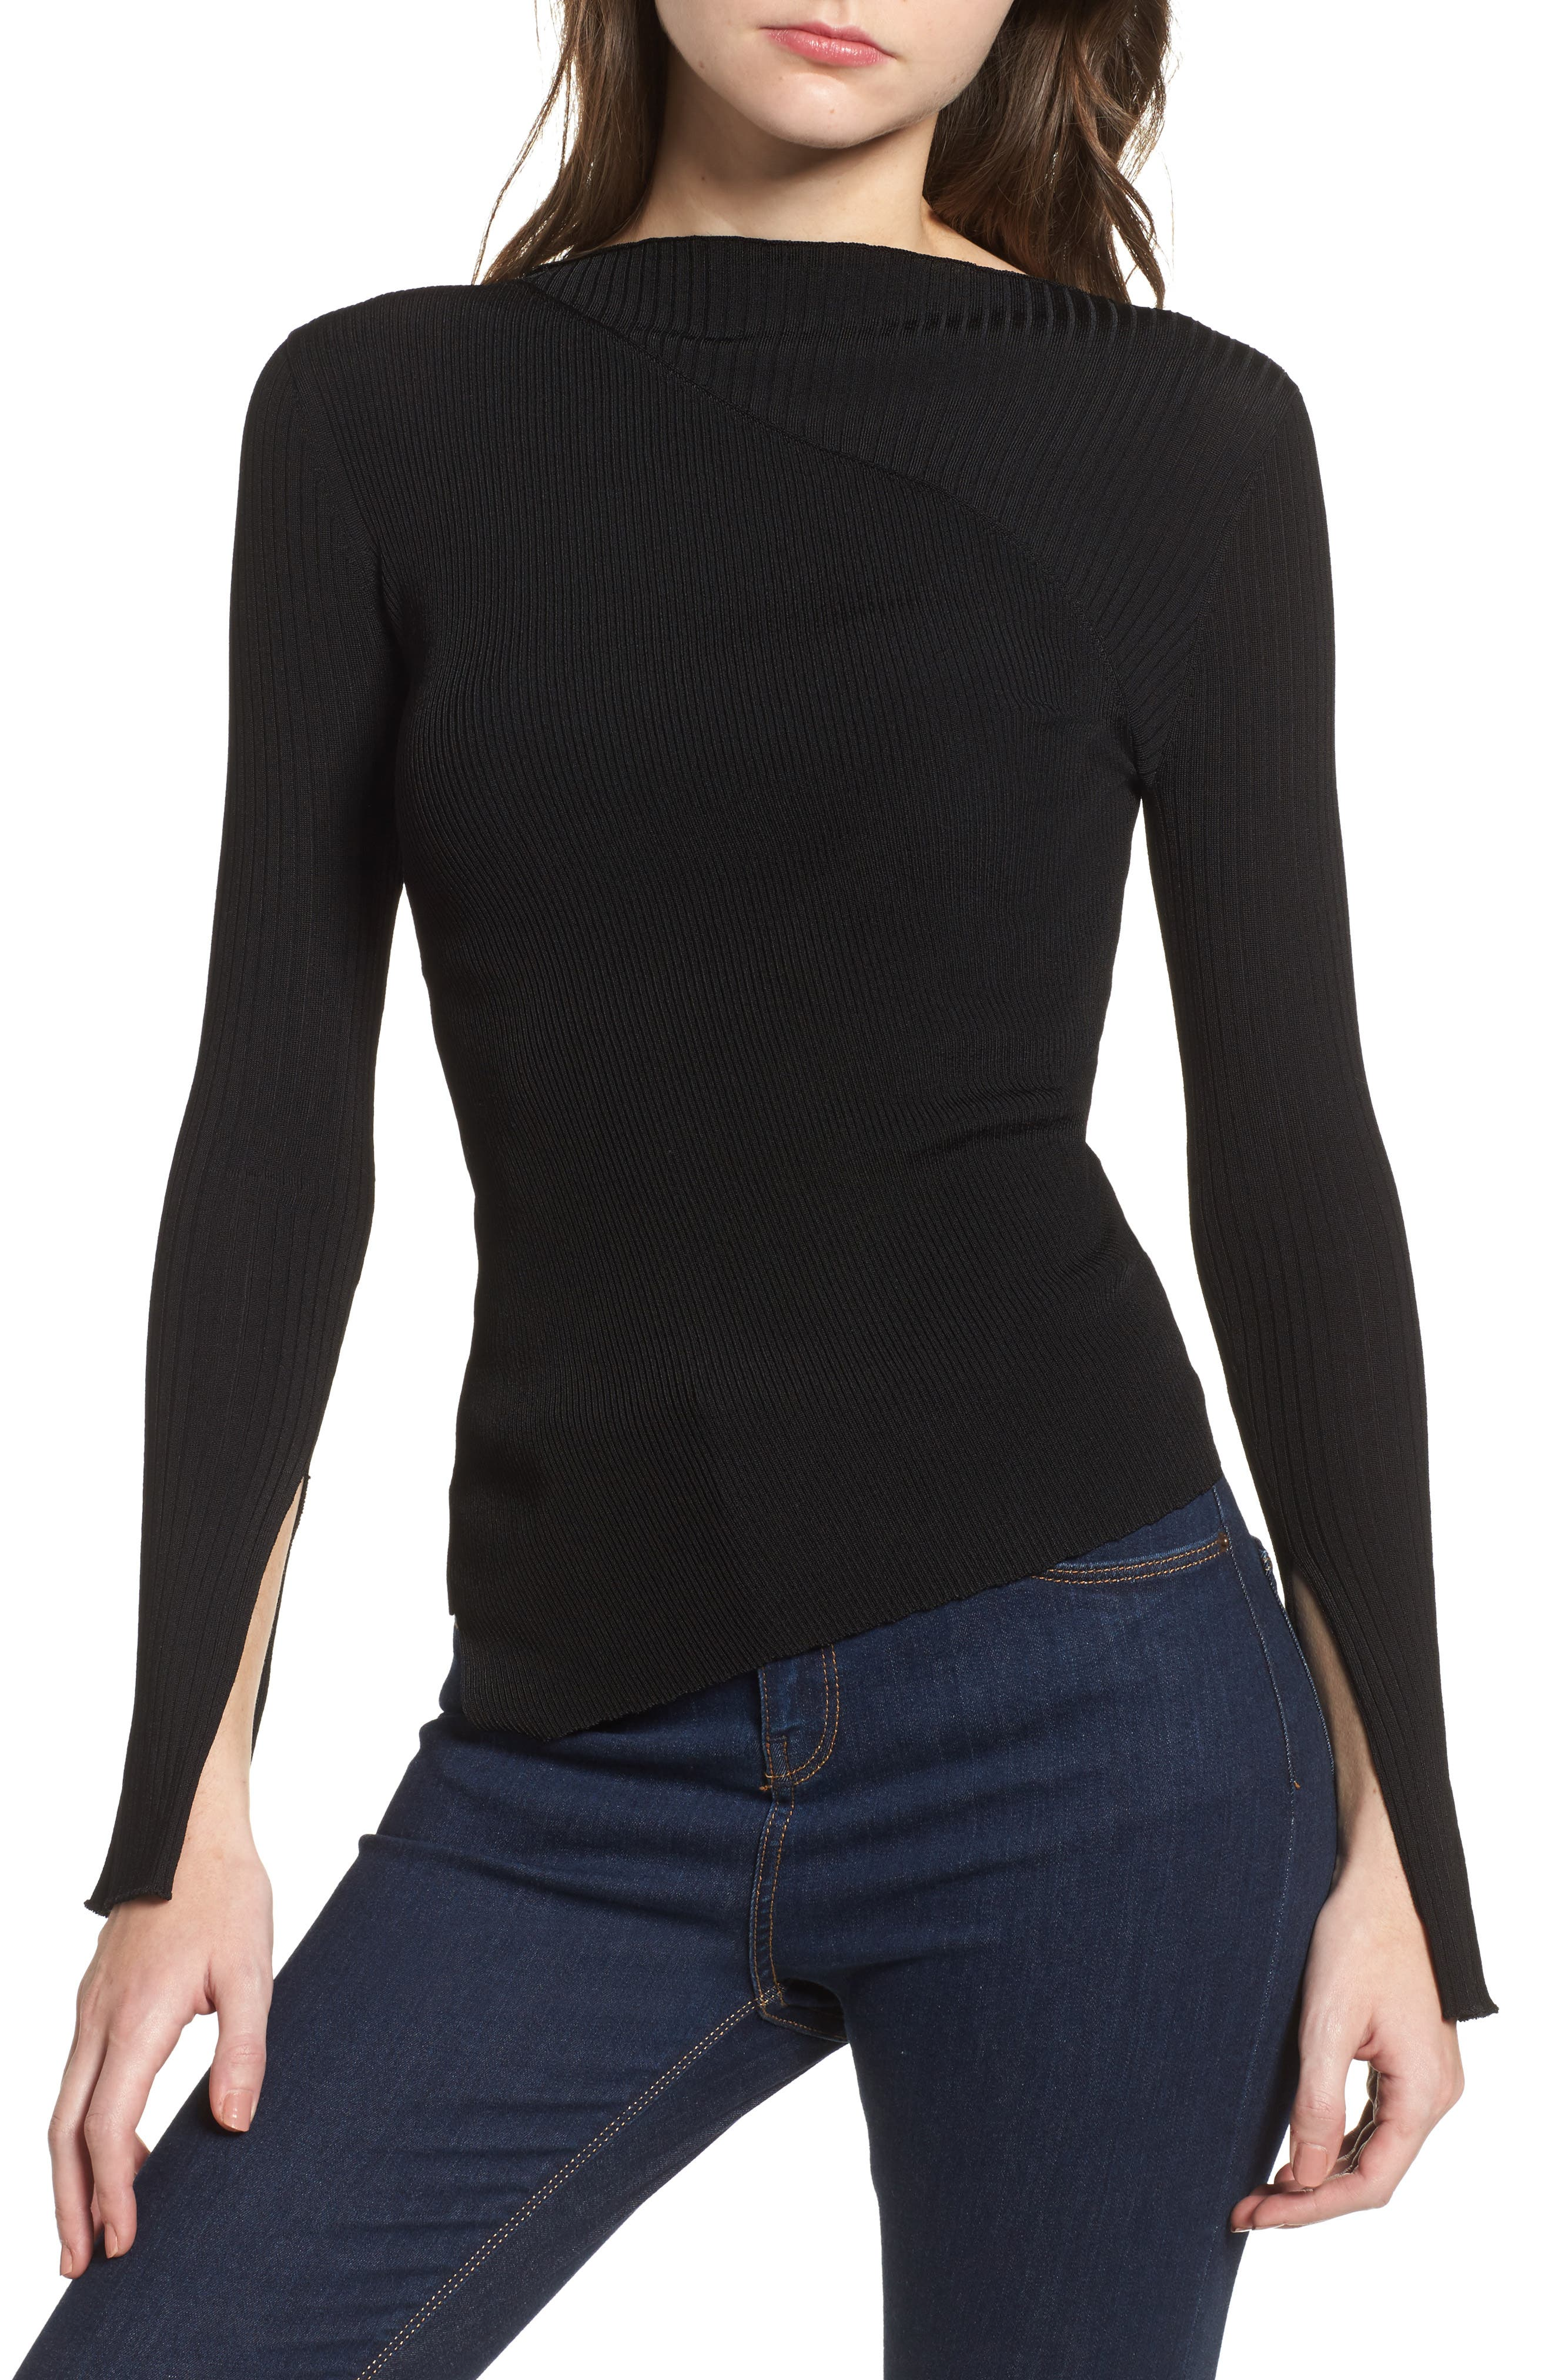 Alternate Image 1 Selected - Topshop Boutique Slash Neck Asymmetrical Top